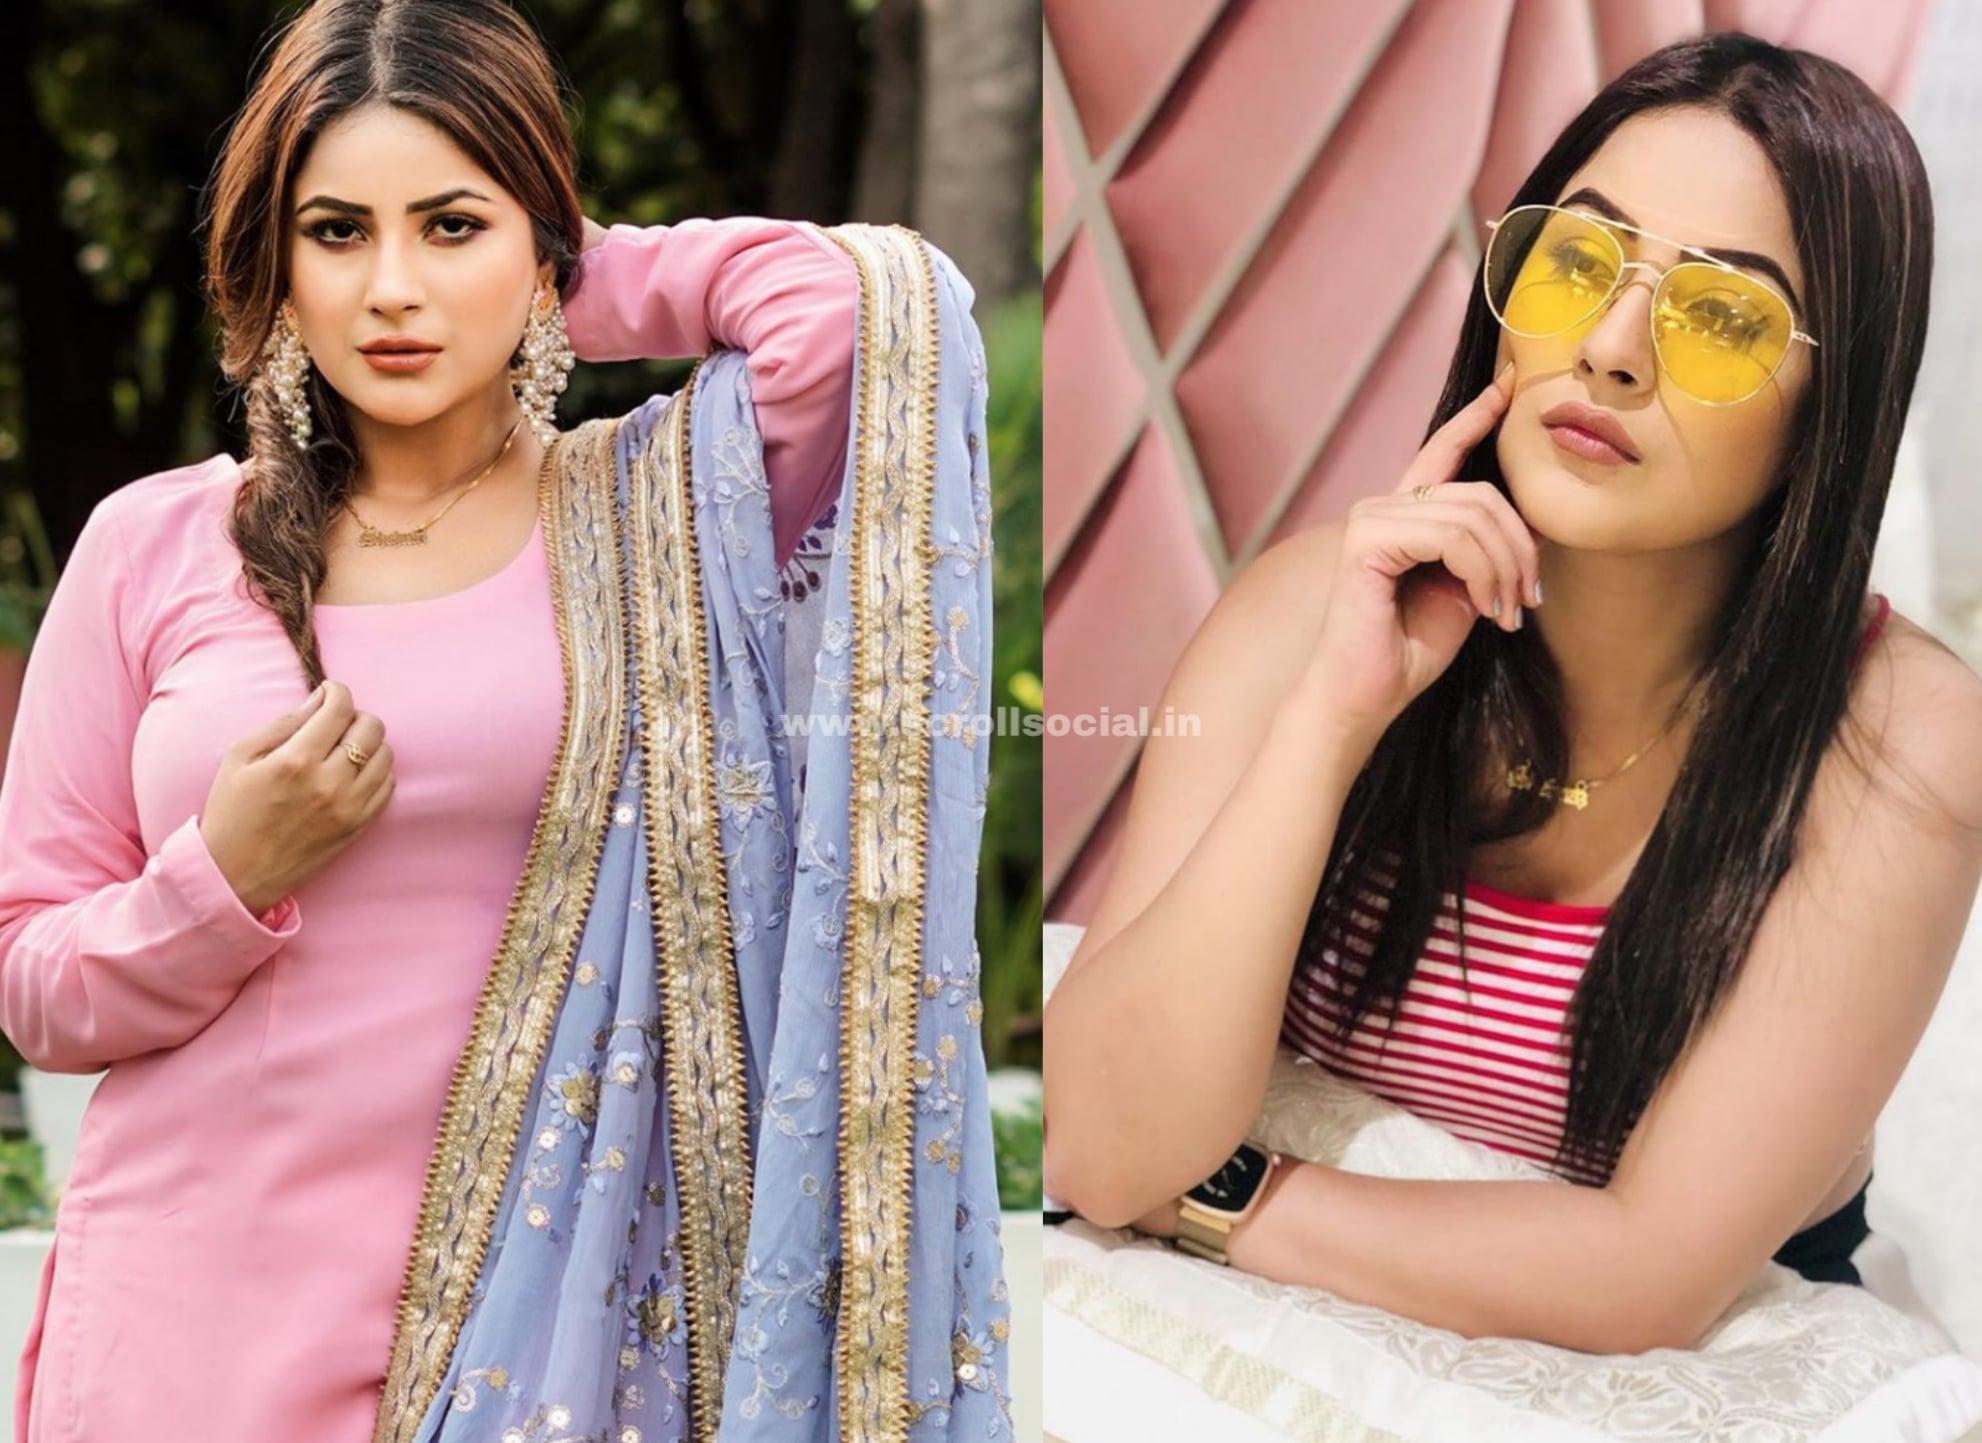 Shehnaaz Kaur Gill Bigg Boss 13 Contestant The Punjabi